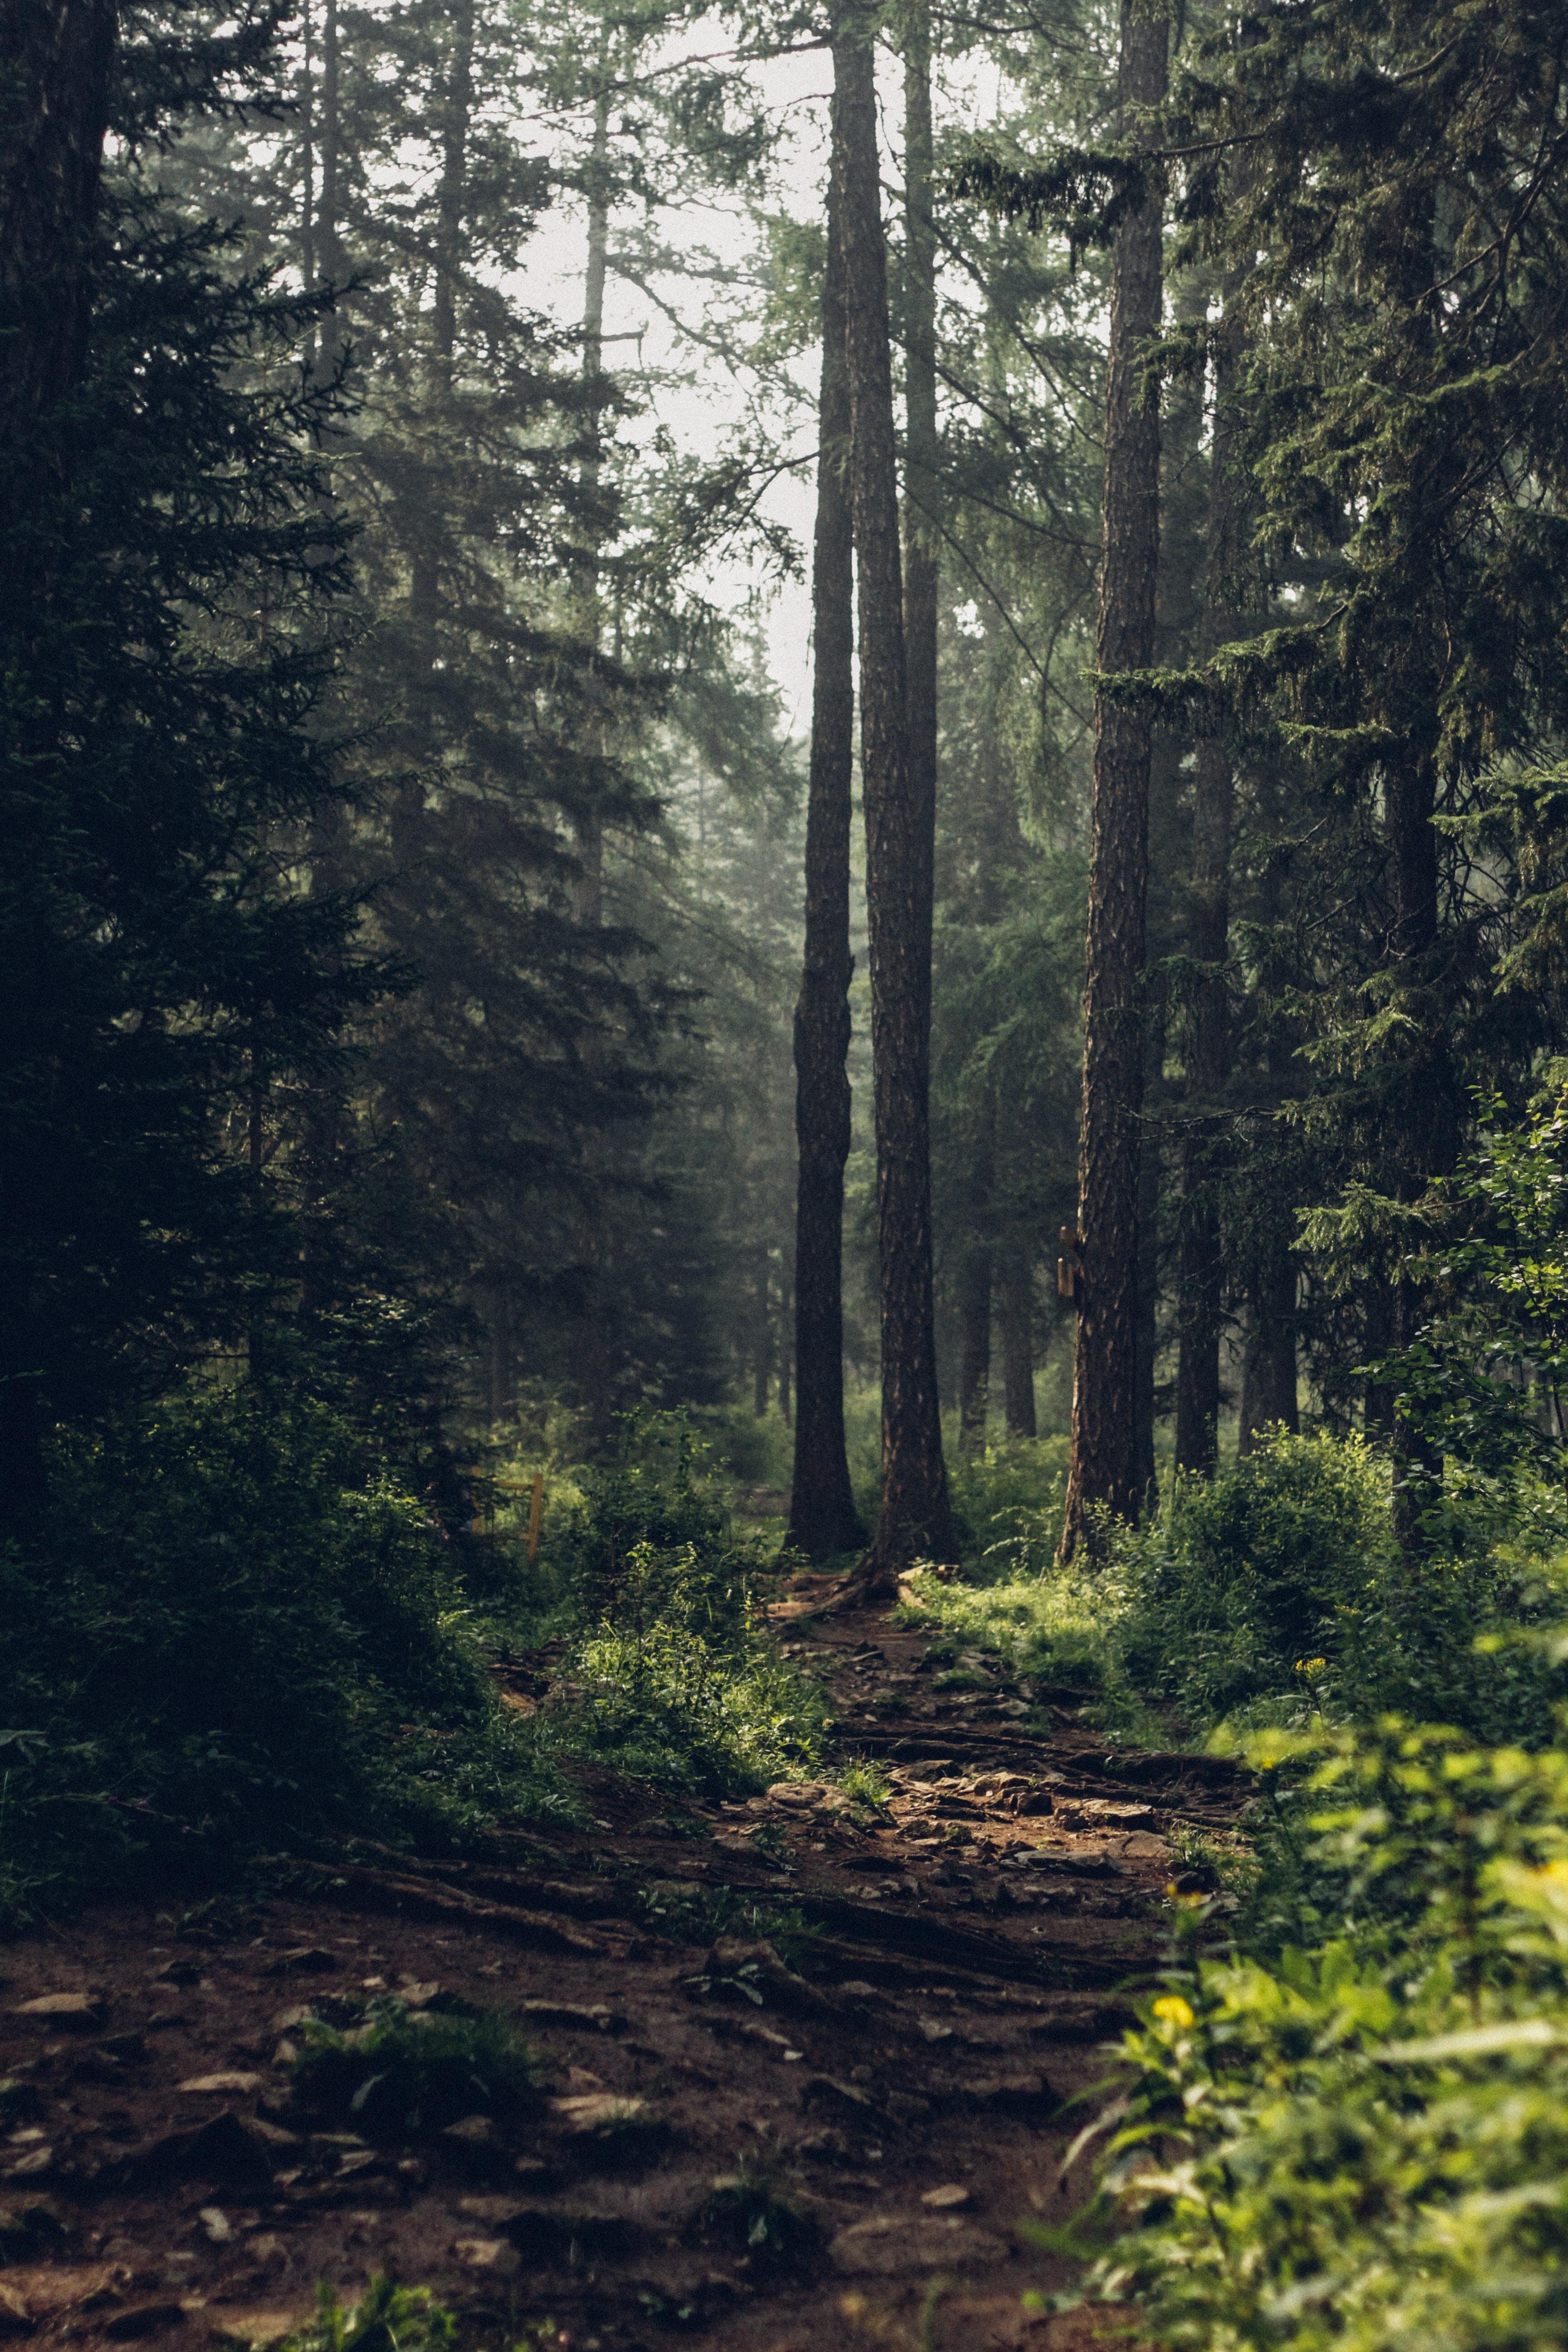 De natuur als jouw portal